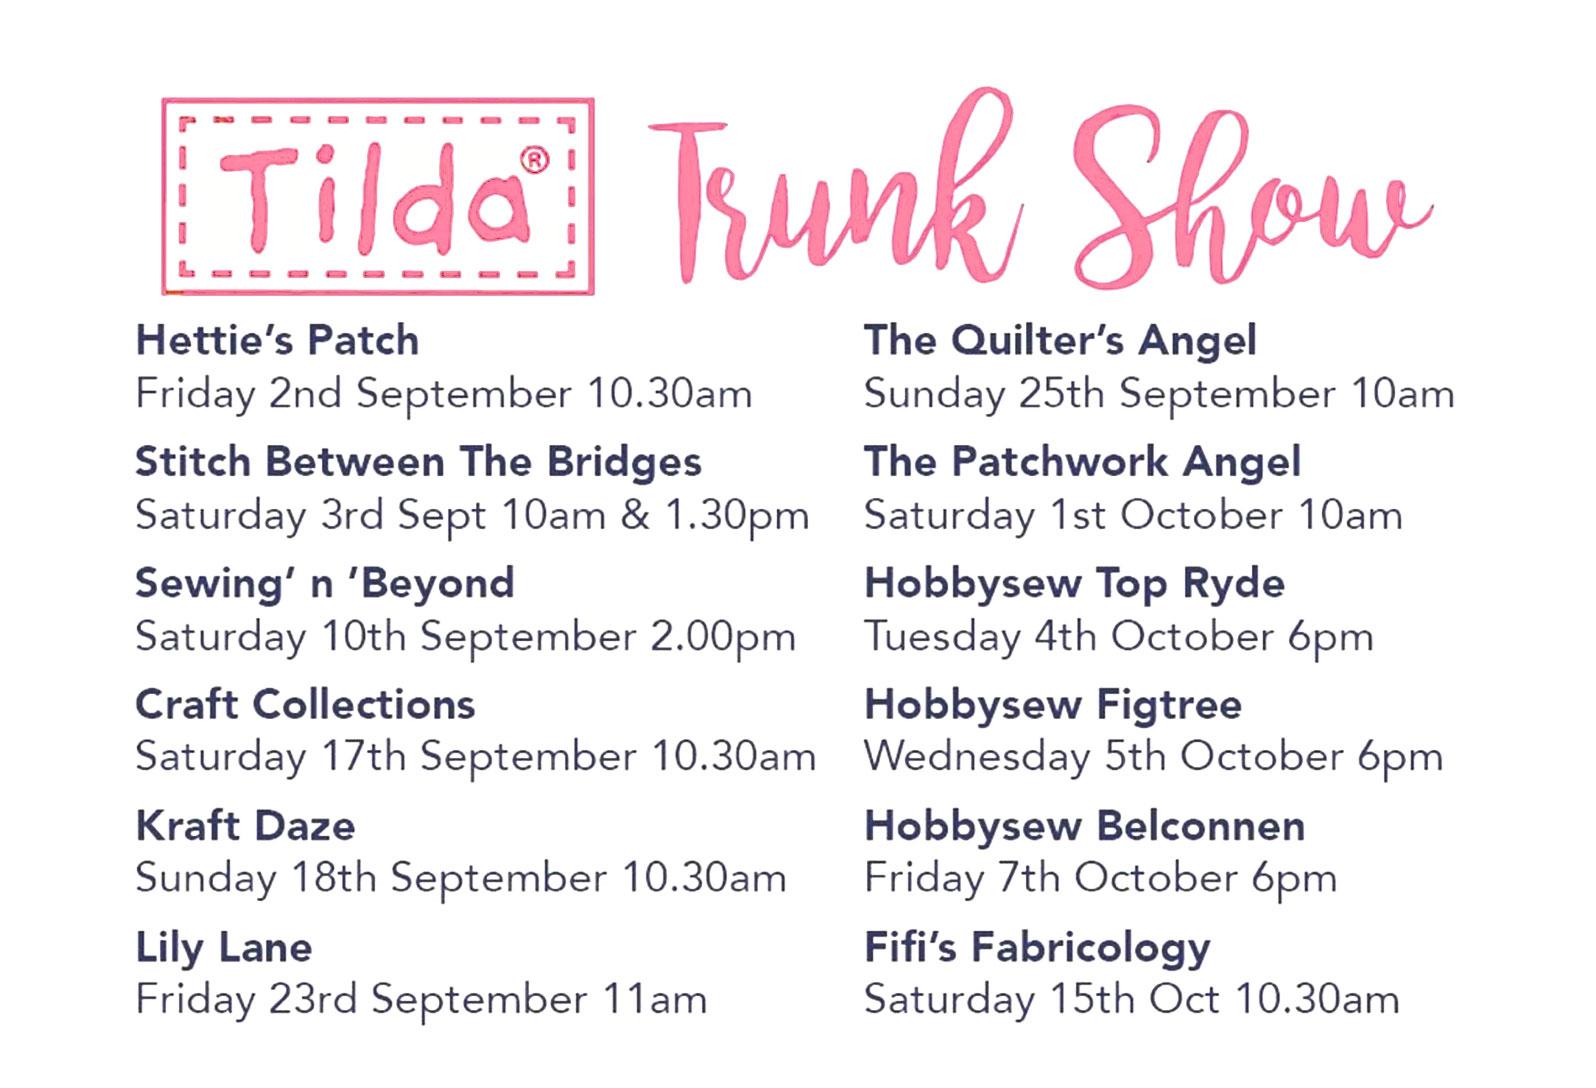 Tilda-Trunk-Show